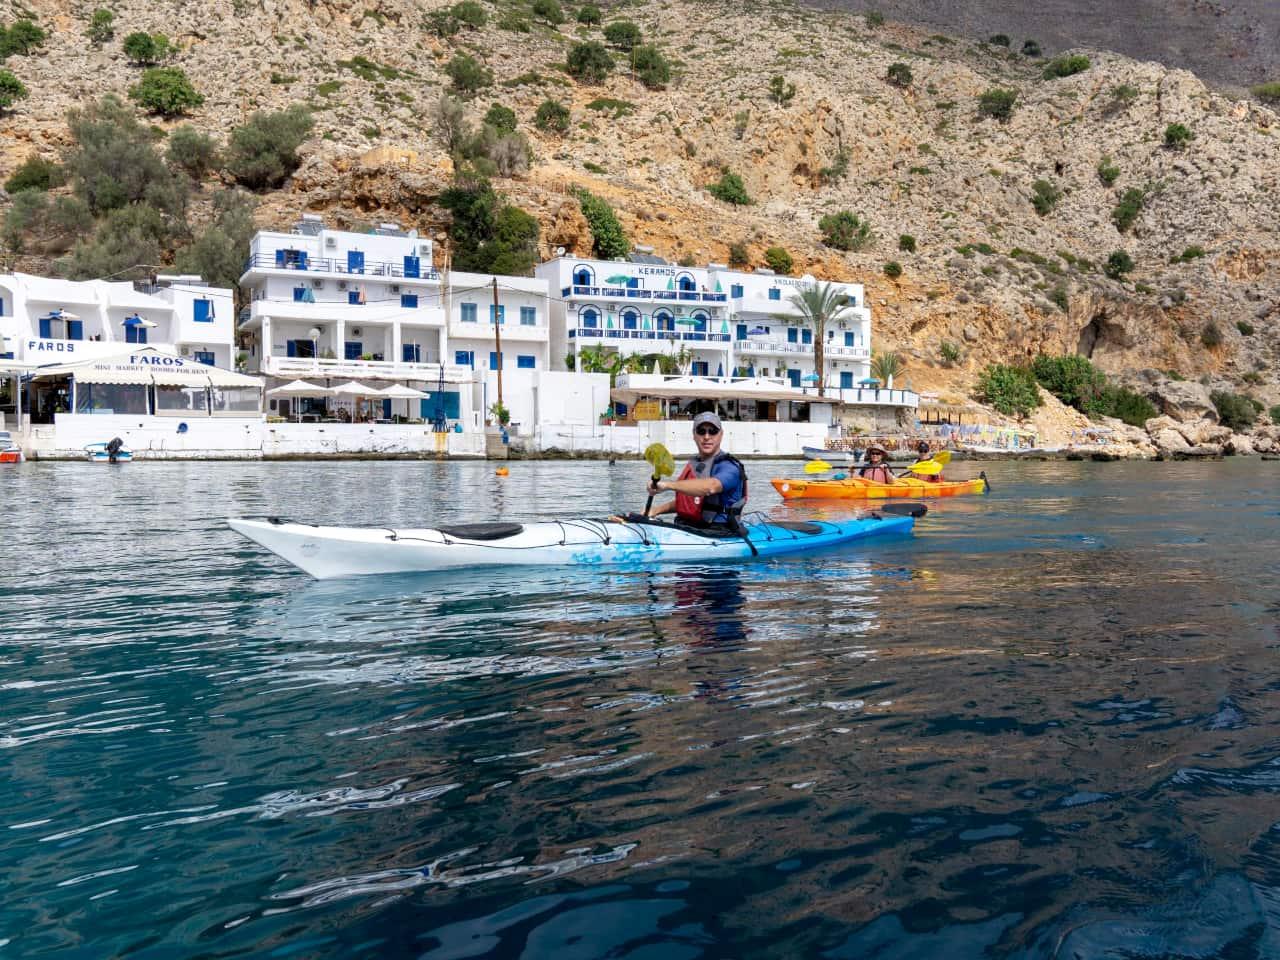 sea kayak trip sfakia loutro, sea kayak trip starting illingas beach, ilingas beach sea kayak trip, best sea kayak trip south crete, sea kayak expeditions chania crete, best sea kayaking trip chania crete